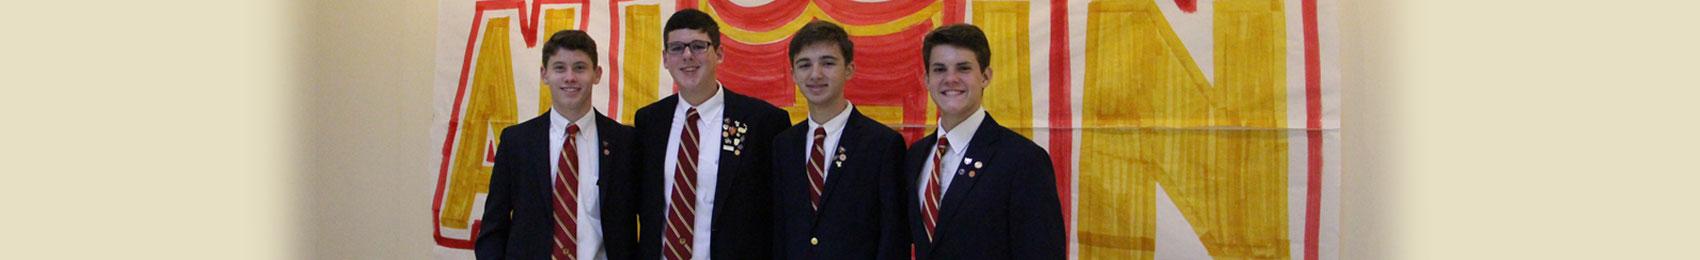 student_ambassadors